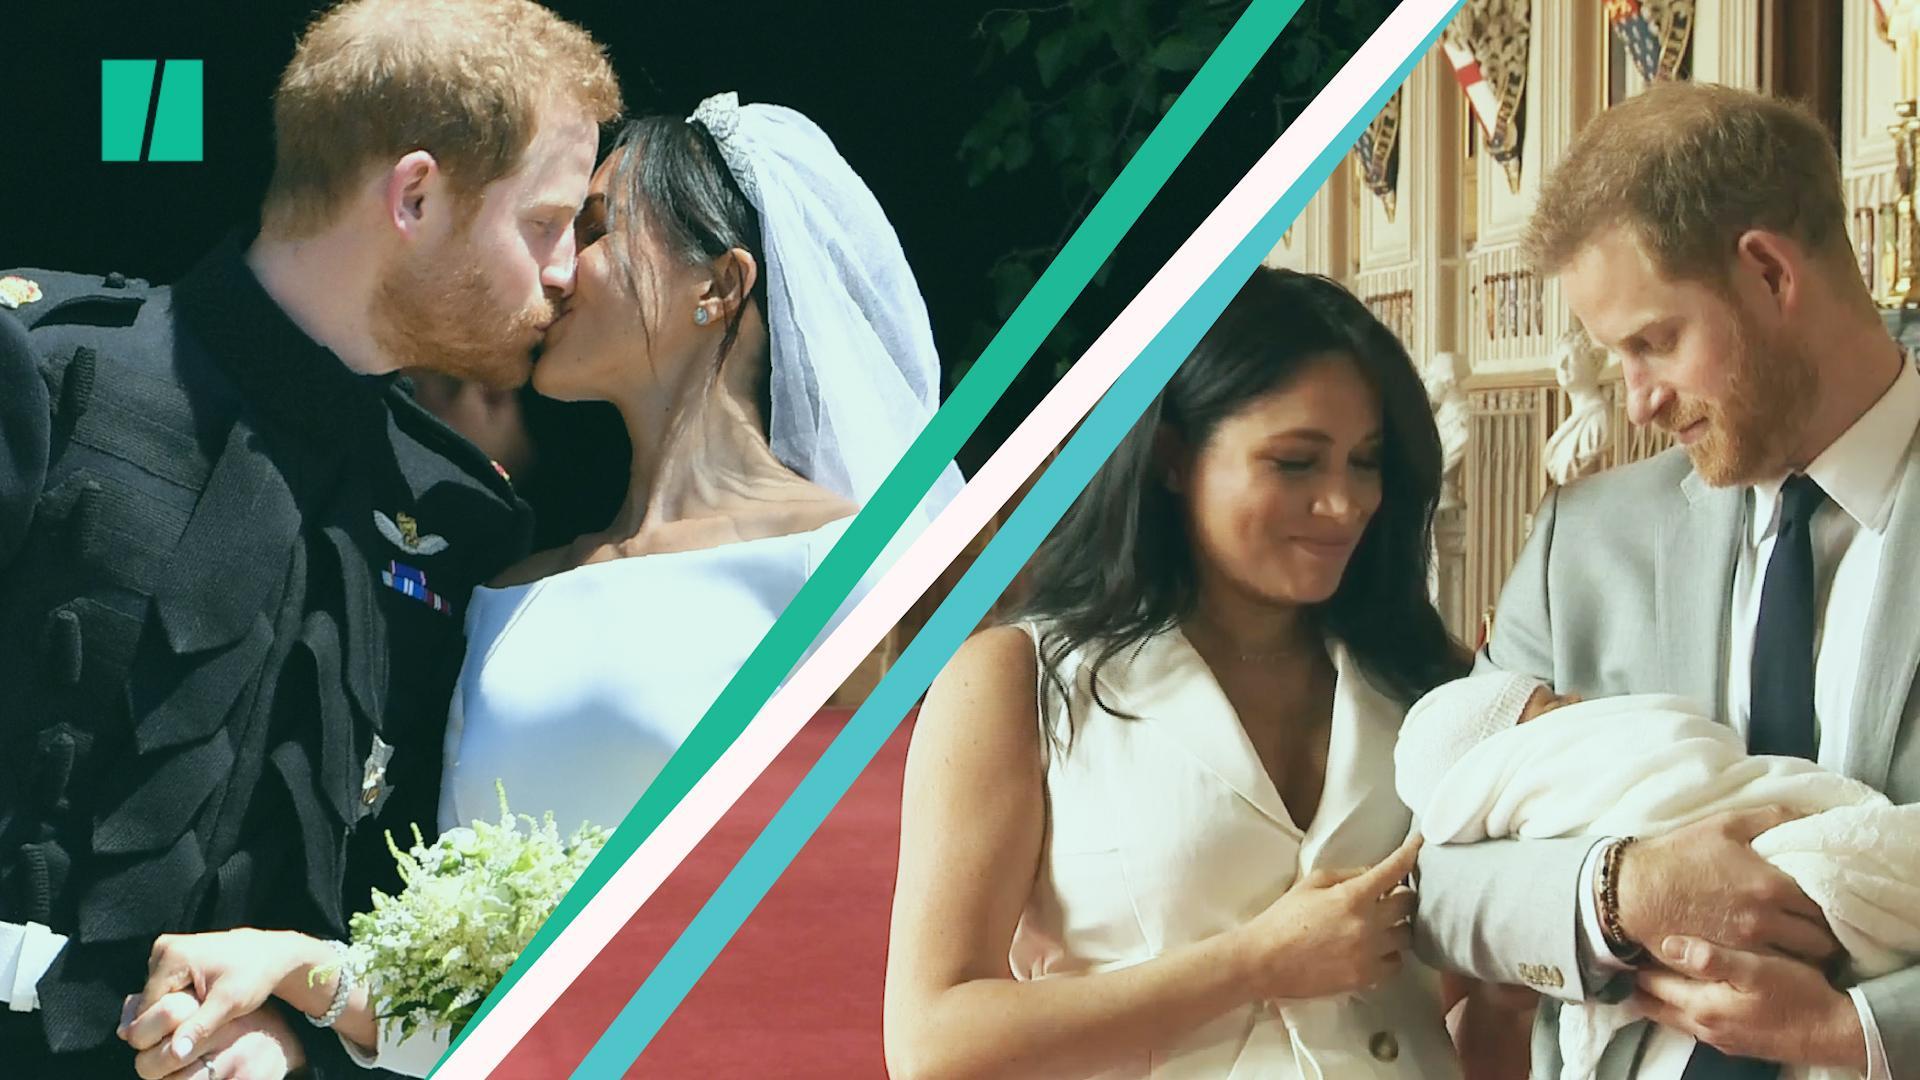 Happy 1st Wedding Anniversary To The Duke And Duchess Of Sussex!